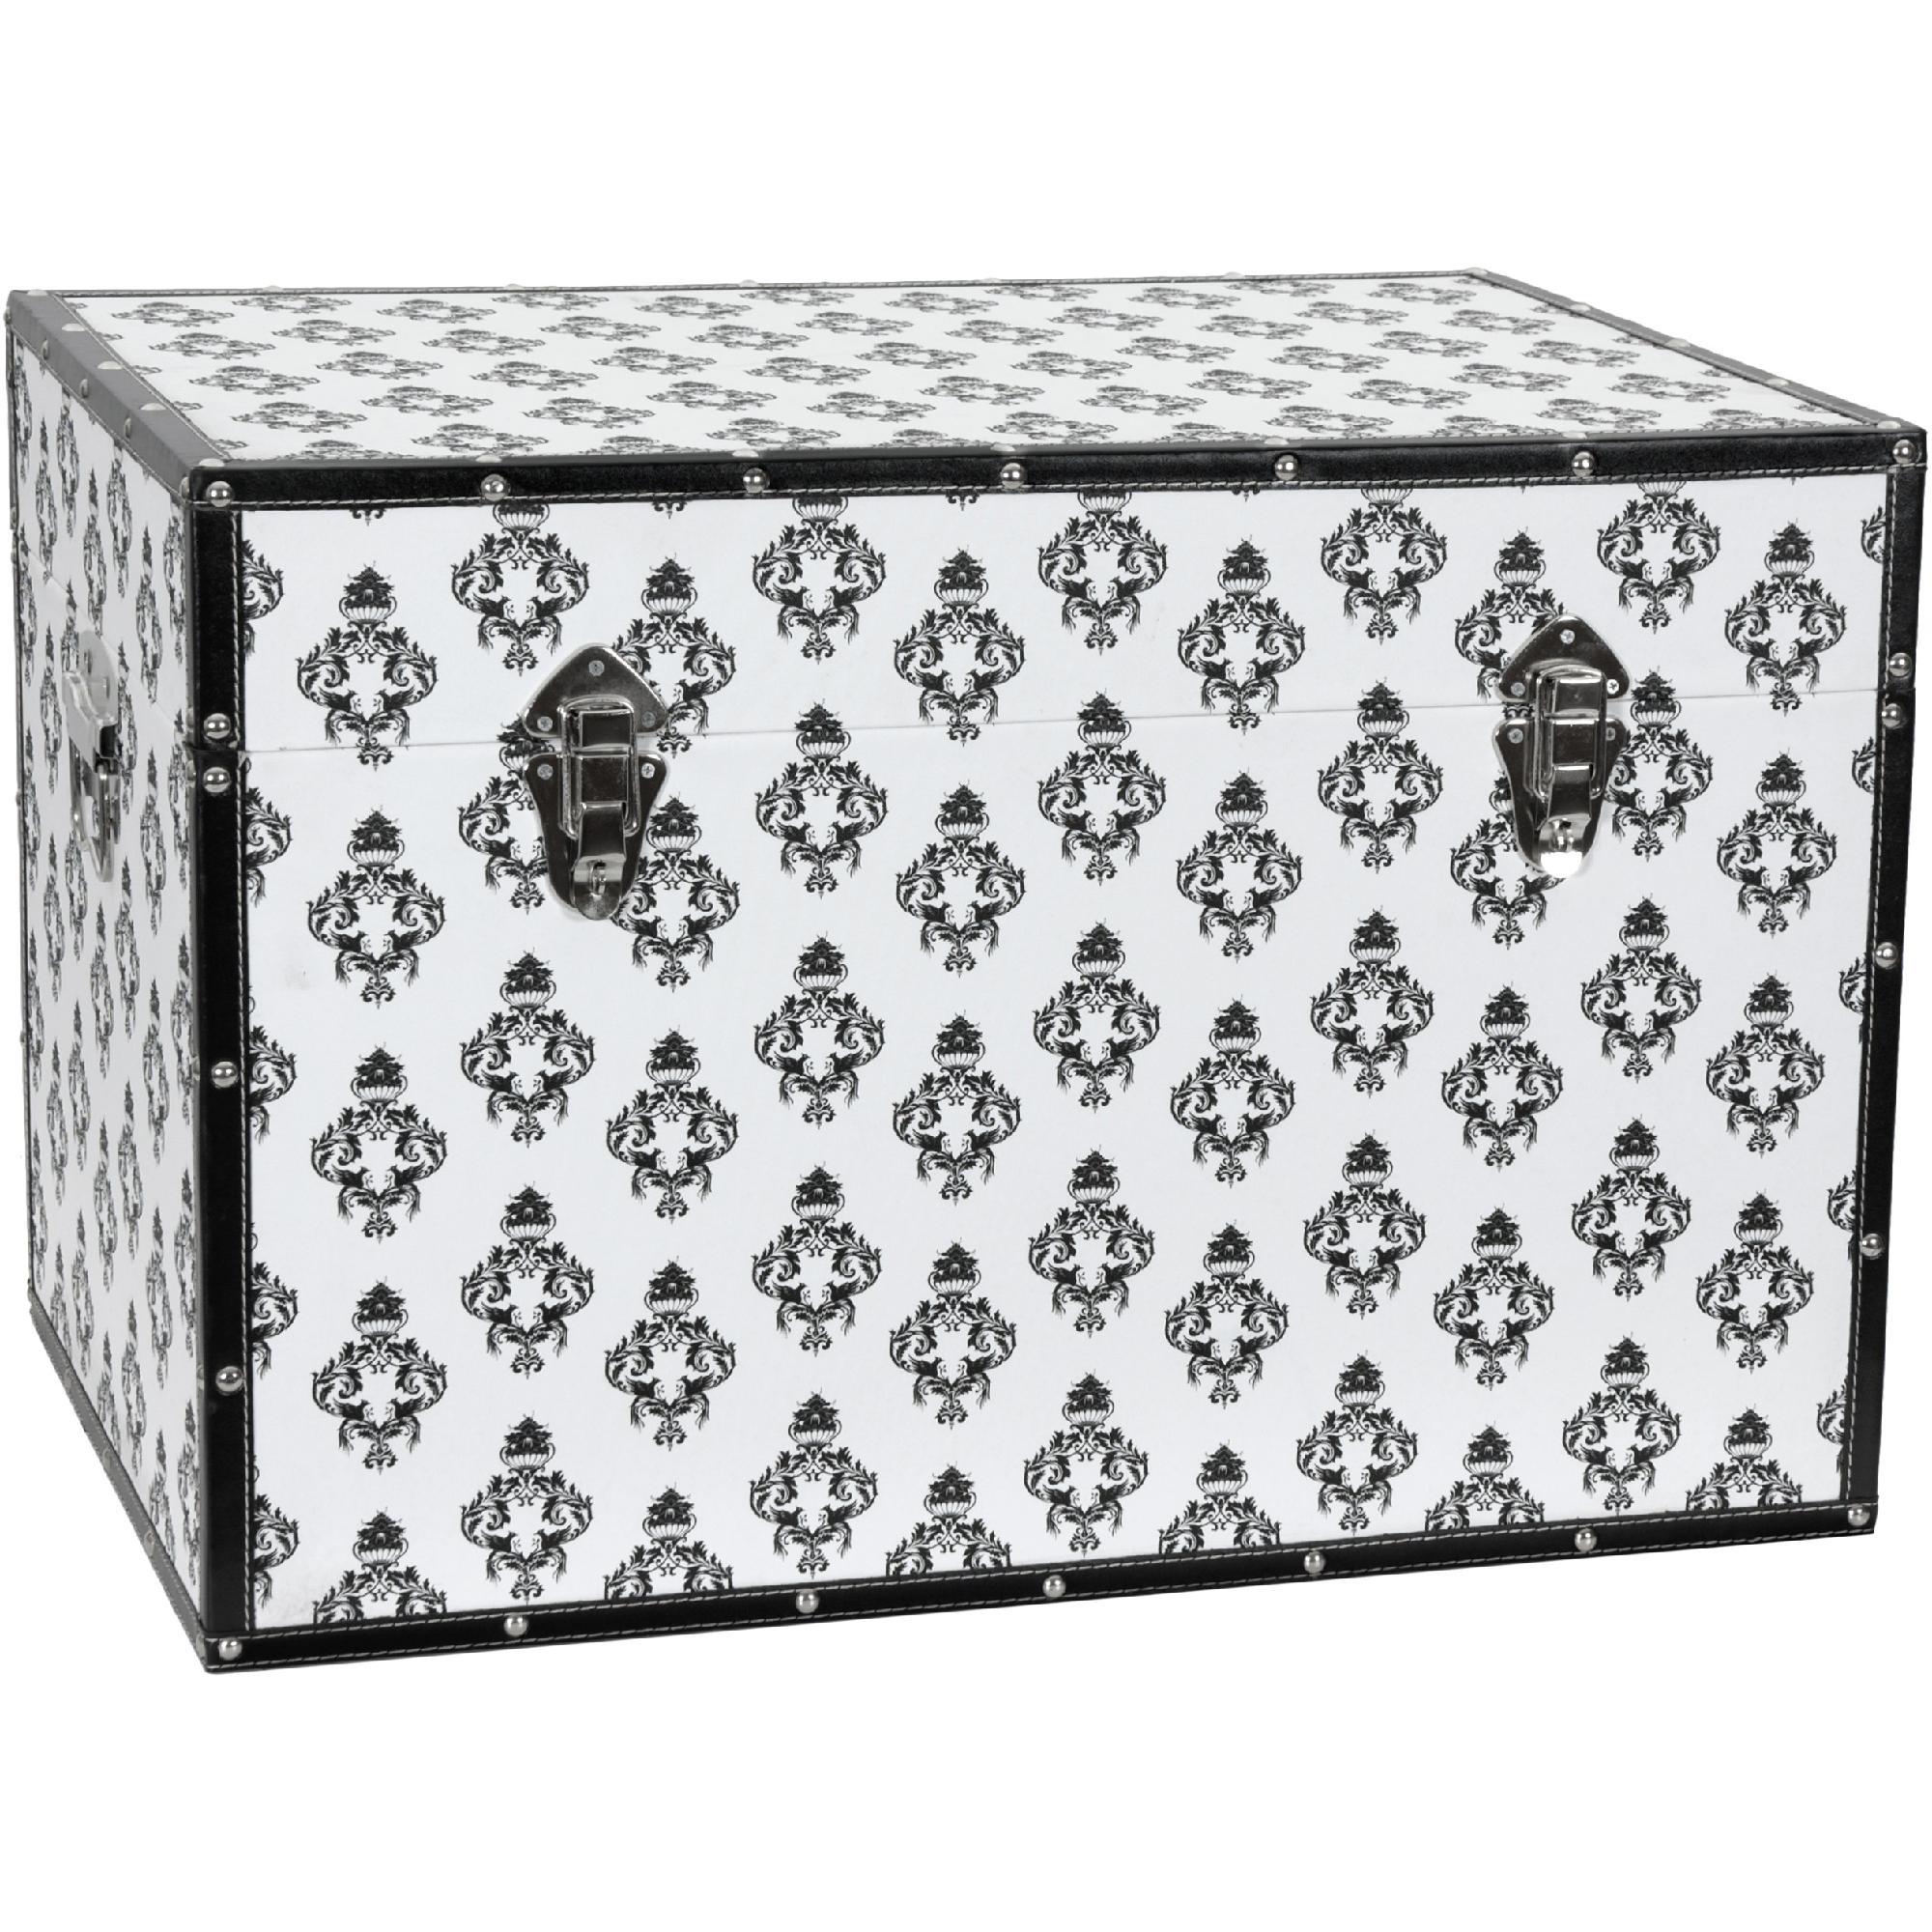 Oriental Furniture Damask Storage Trunk - White